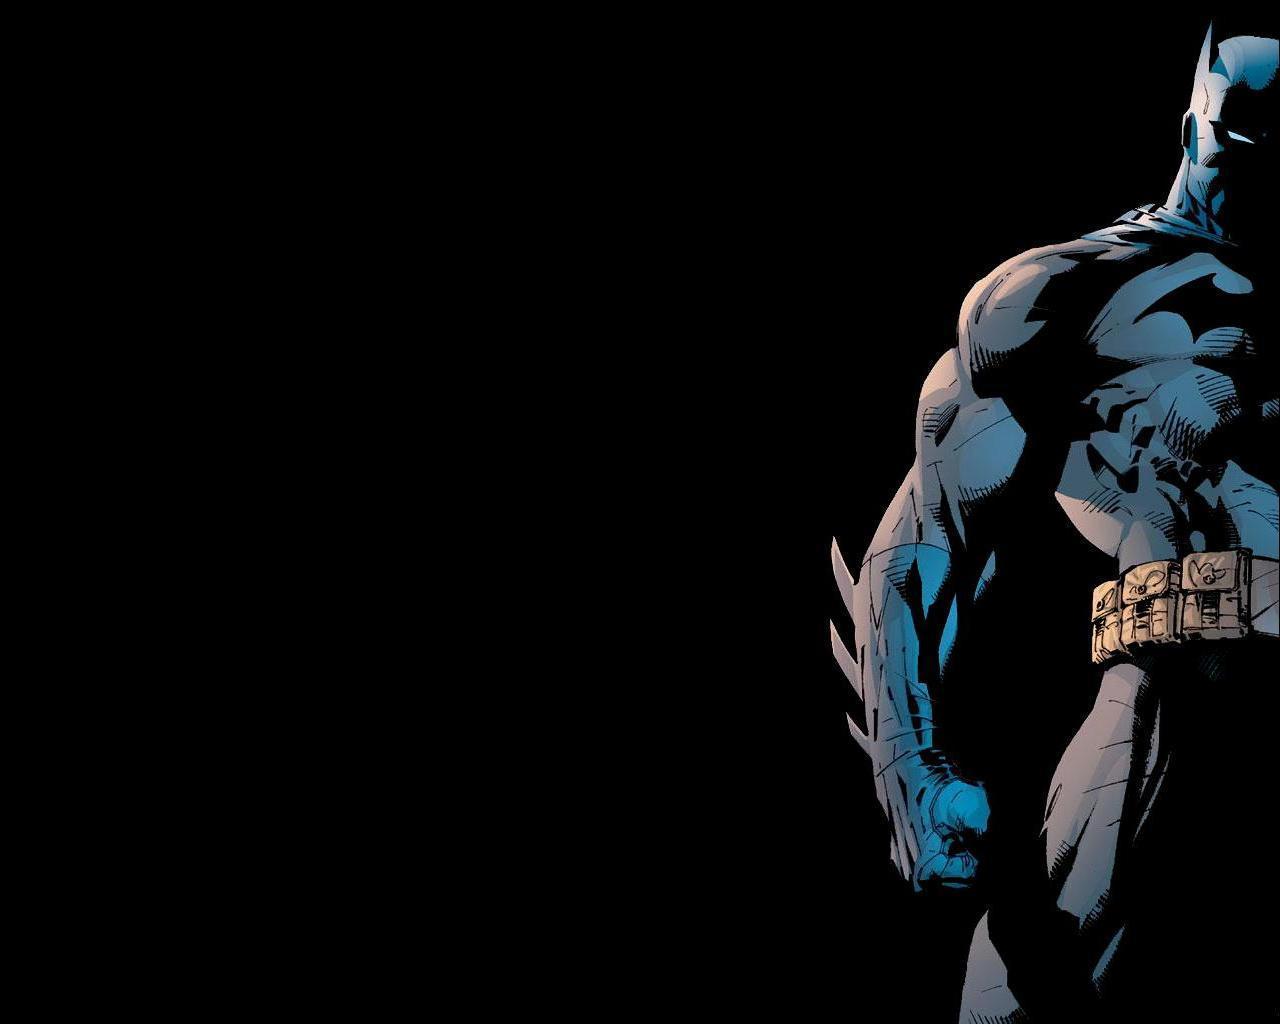 Batman Batman 1280x1024